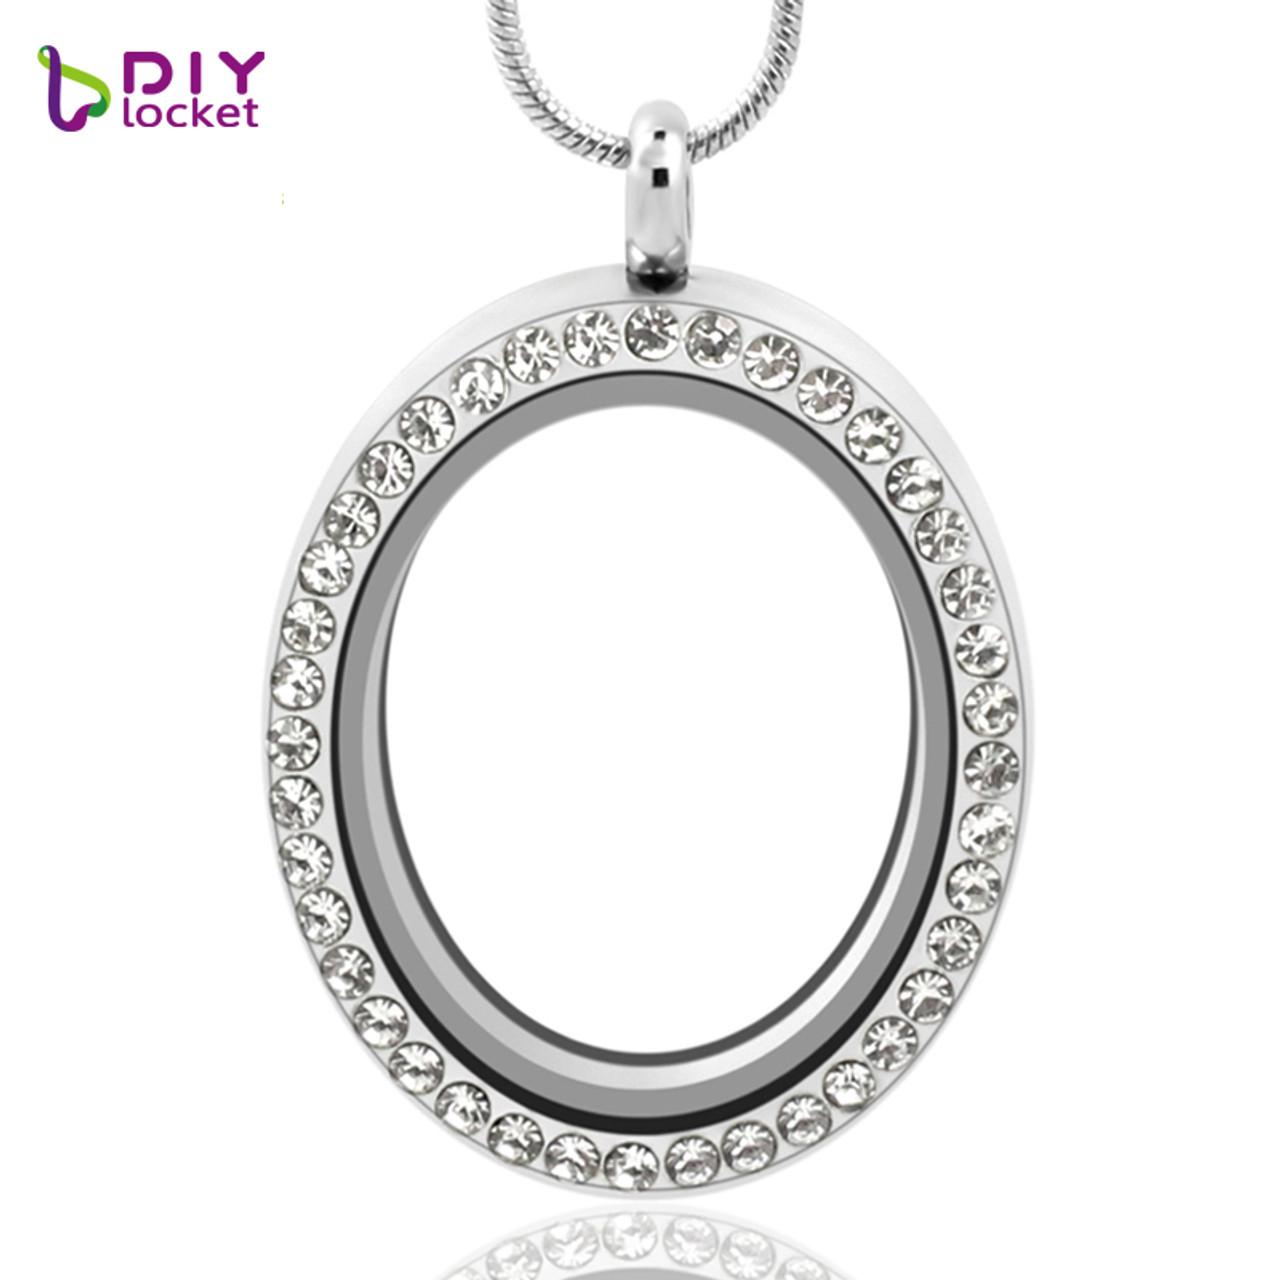 Diylocketcom Jewelry Wholesale Oval Floating Locket Pendant 4